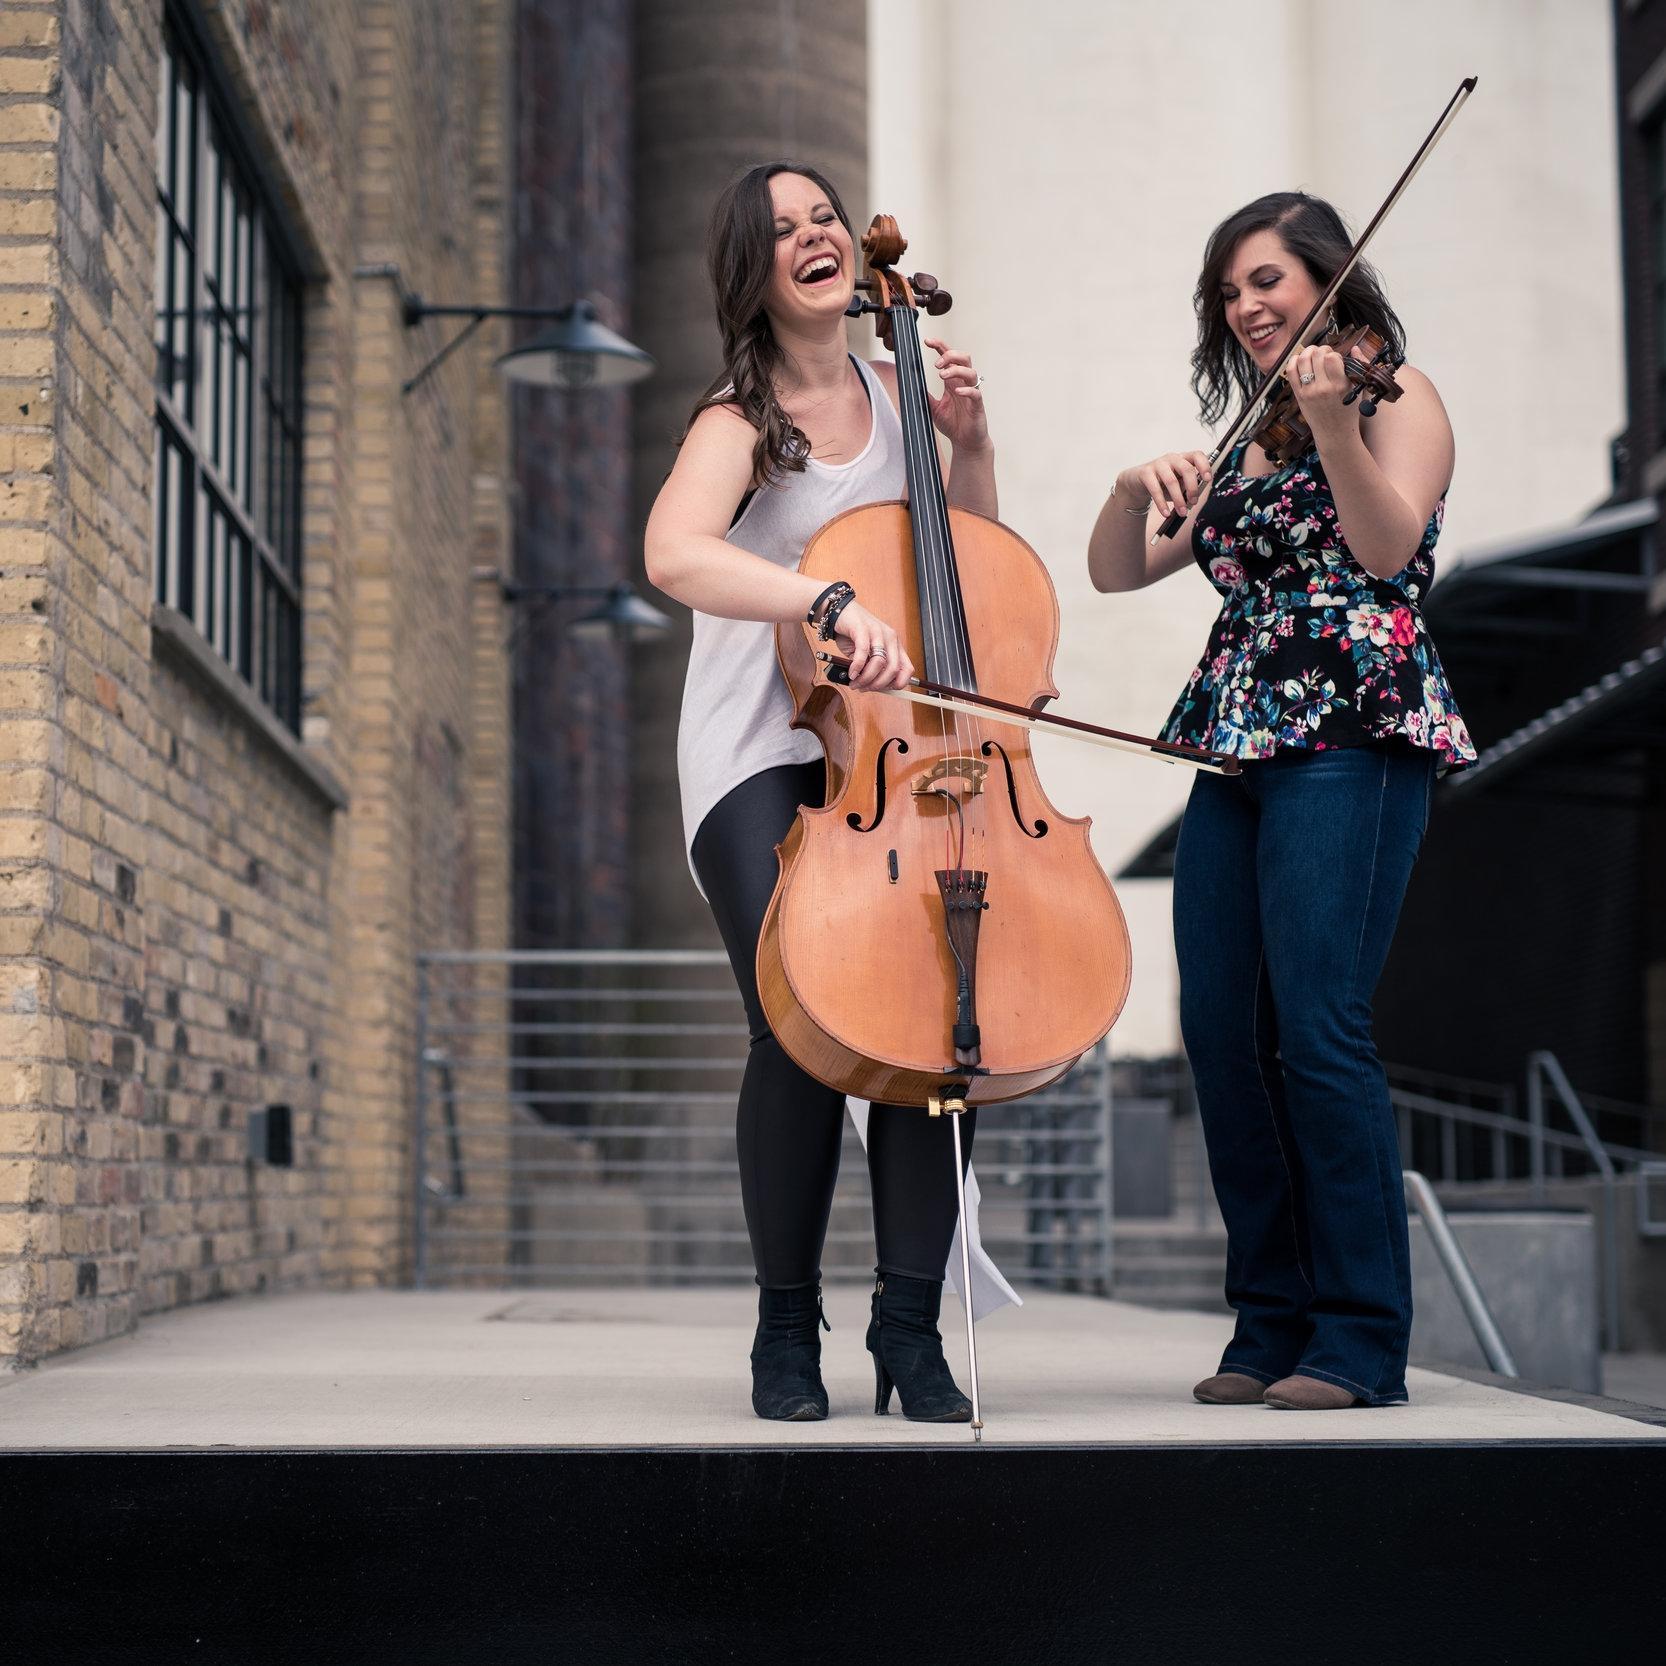 The OK Factor: Olivia Diercks,  cello and  Karla Colahan,  violin